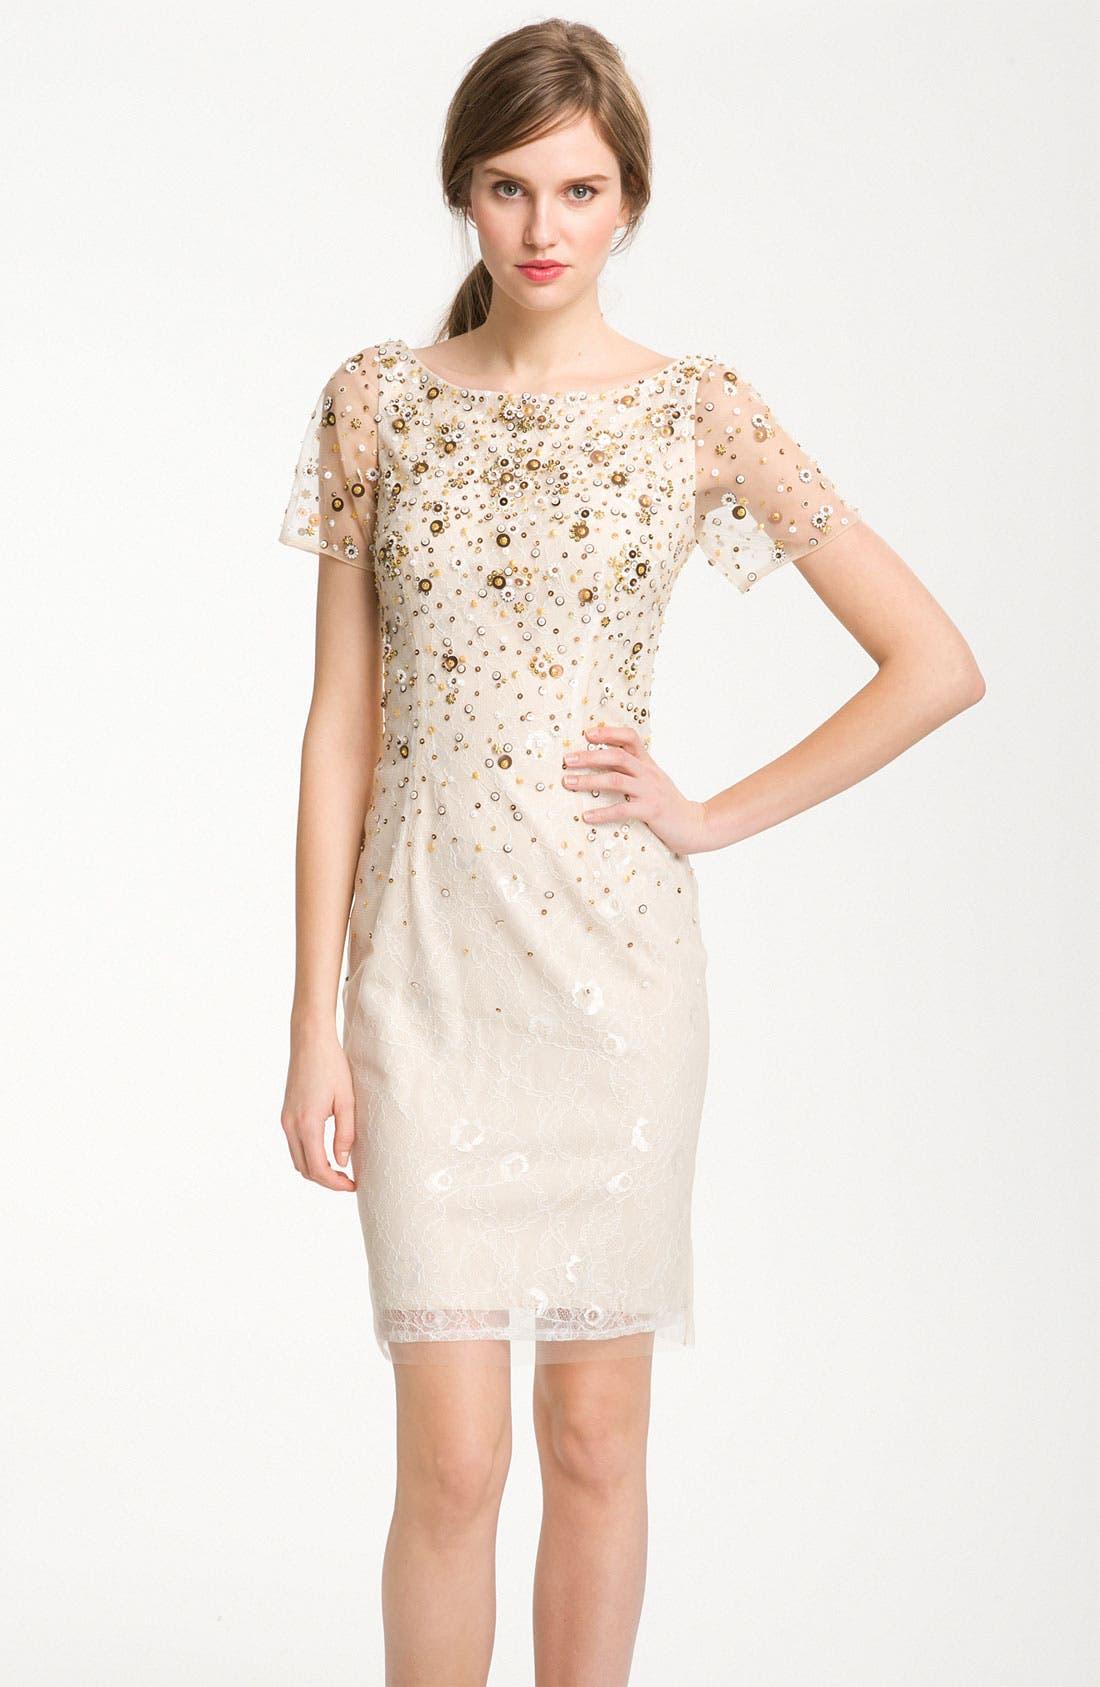 Alternate Image 1 Selected - Kathy Hilton Sheer Sleeve Sequin Cocktail Dress